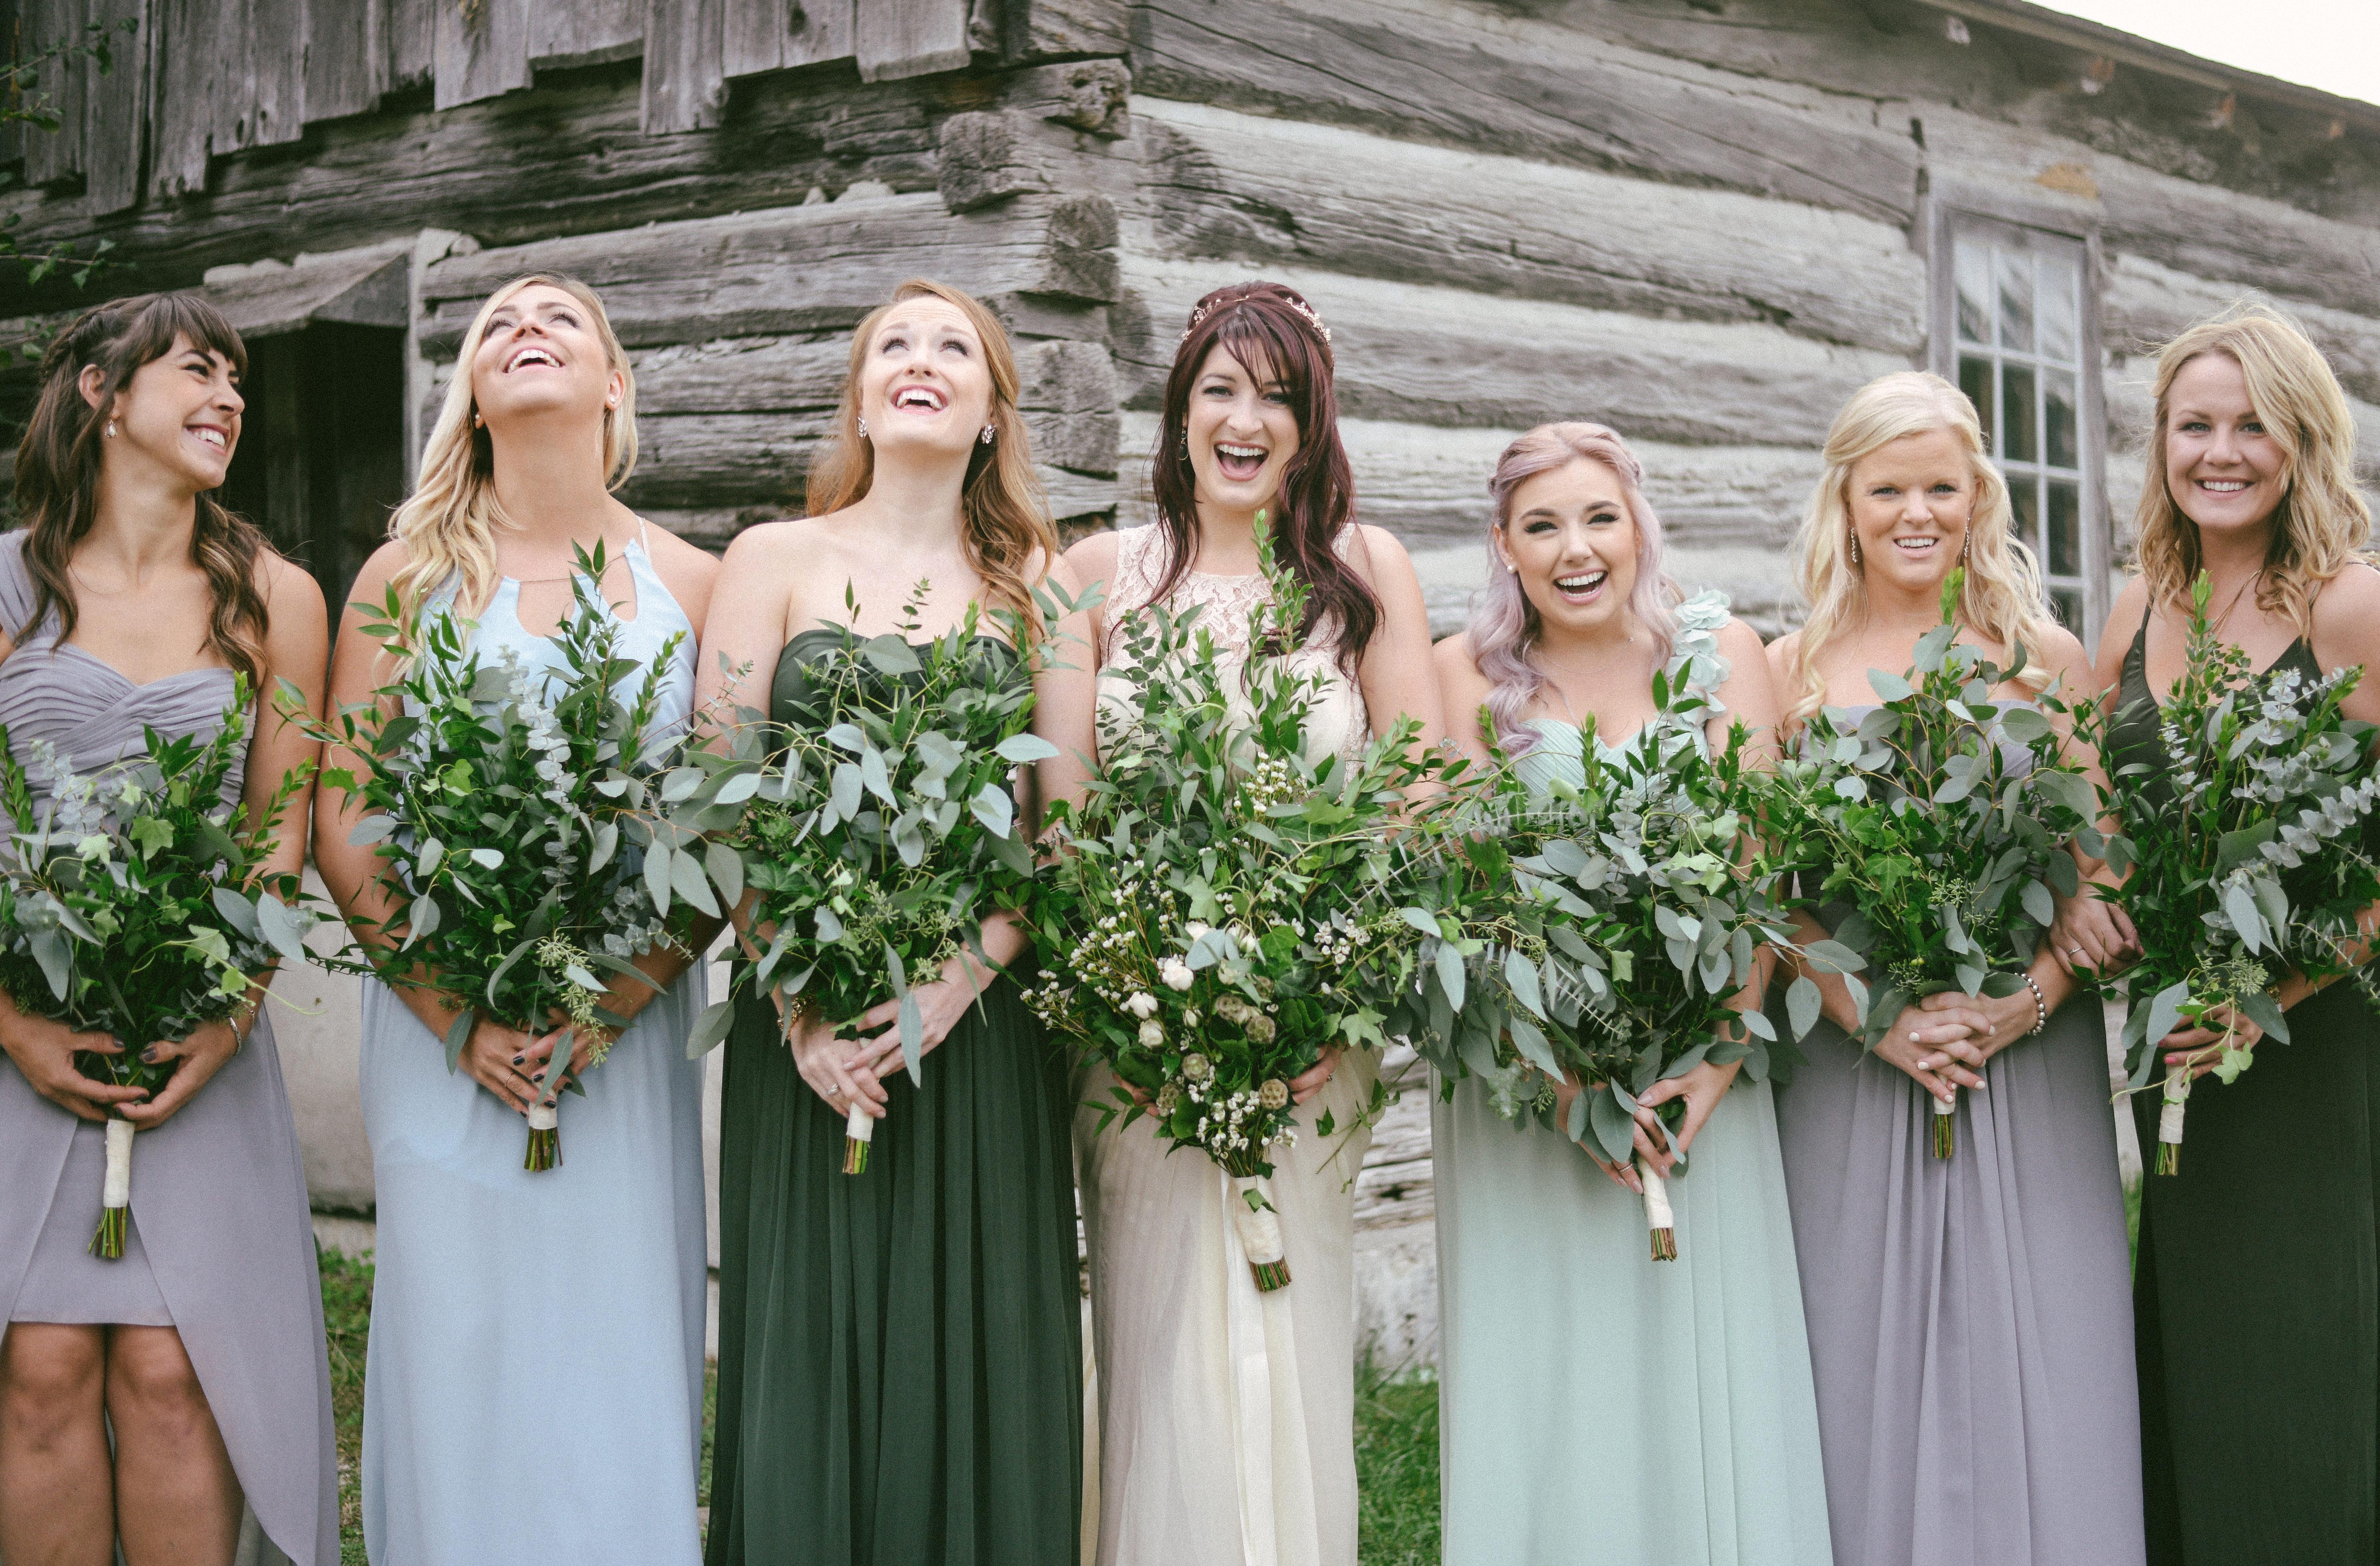 Music Filled Canadian bridesmaids Wedding By Megan Ewing Creative